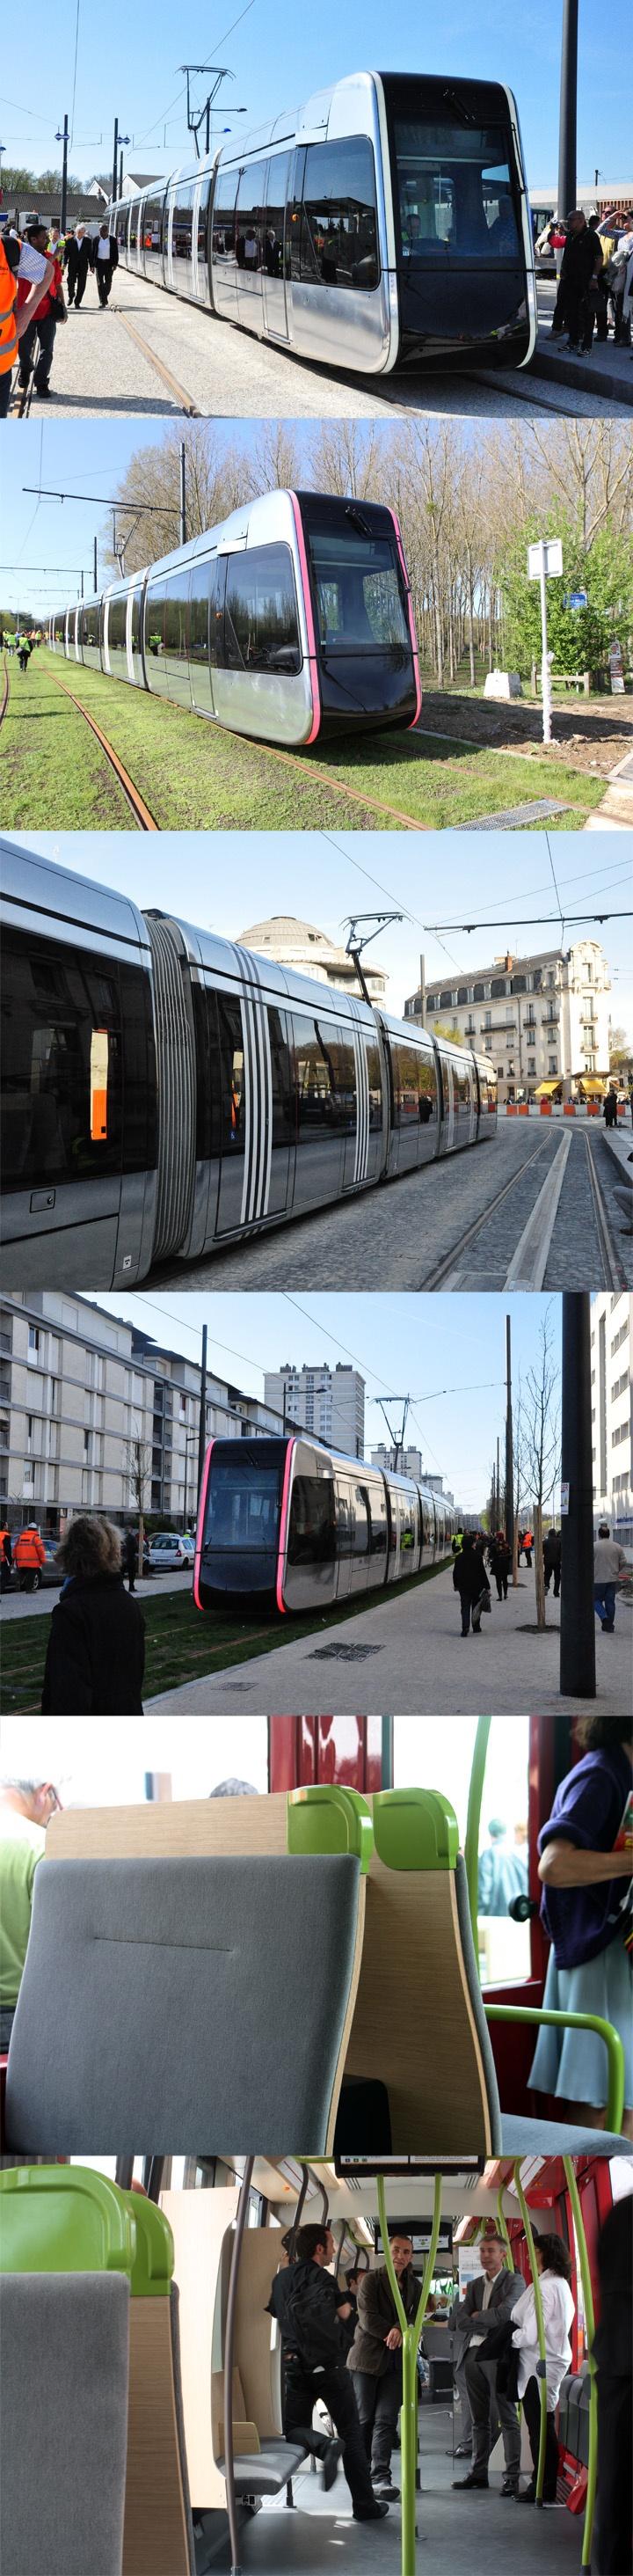 18 Apr 2013 - First train run - Tramway / Tram of Tours - rcp design global